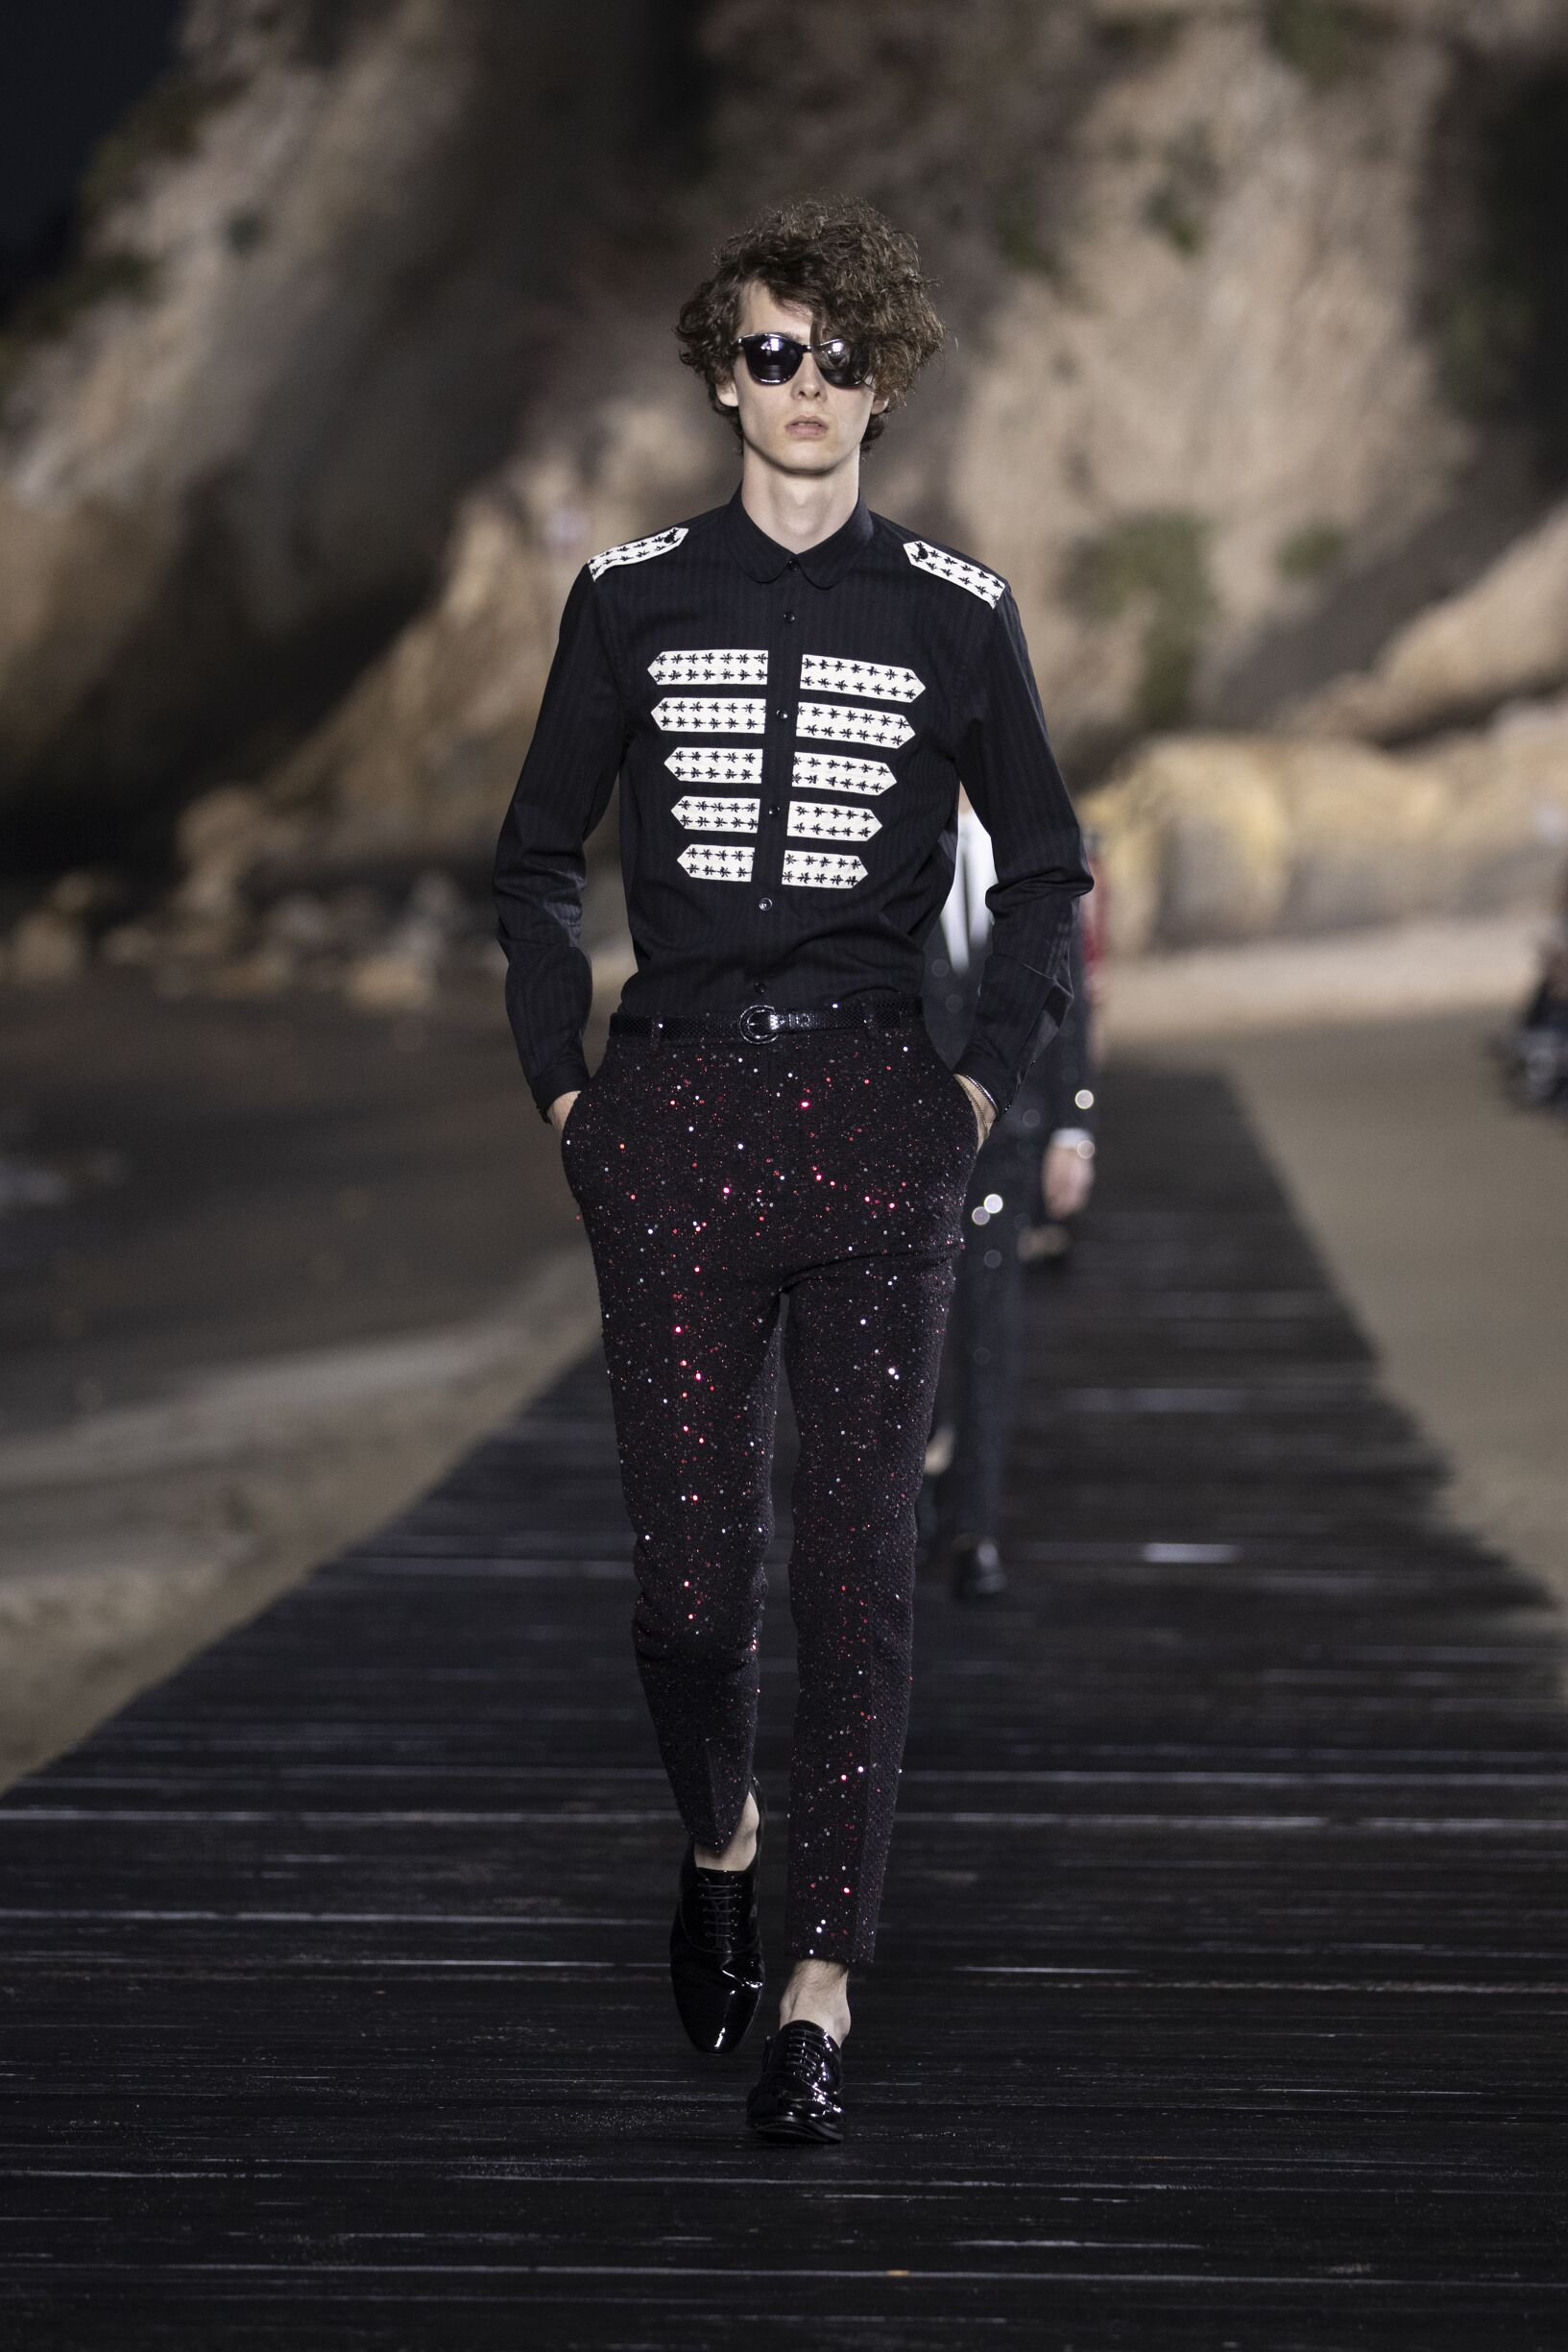 Runway Saint Laurent Spring Summer 2020 Men's Collection Malibu Fashion Show